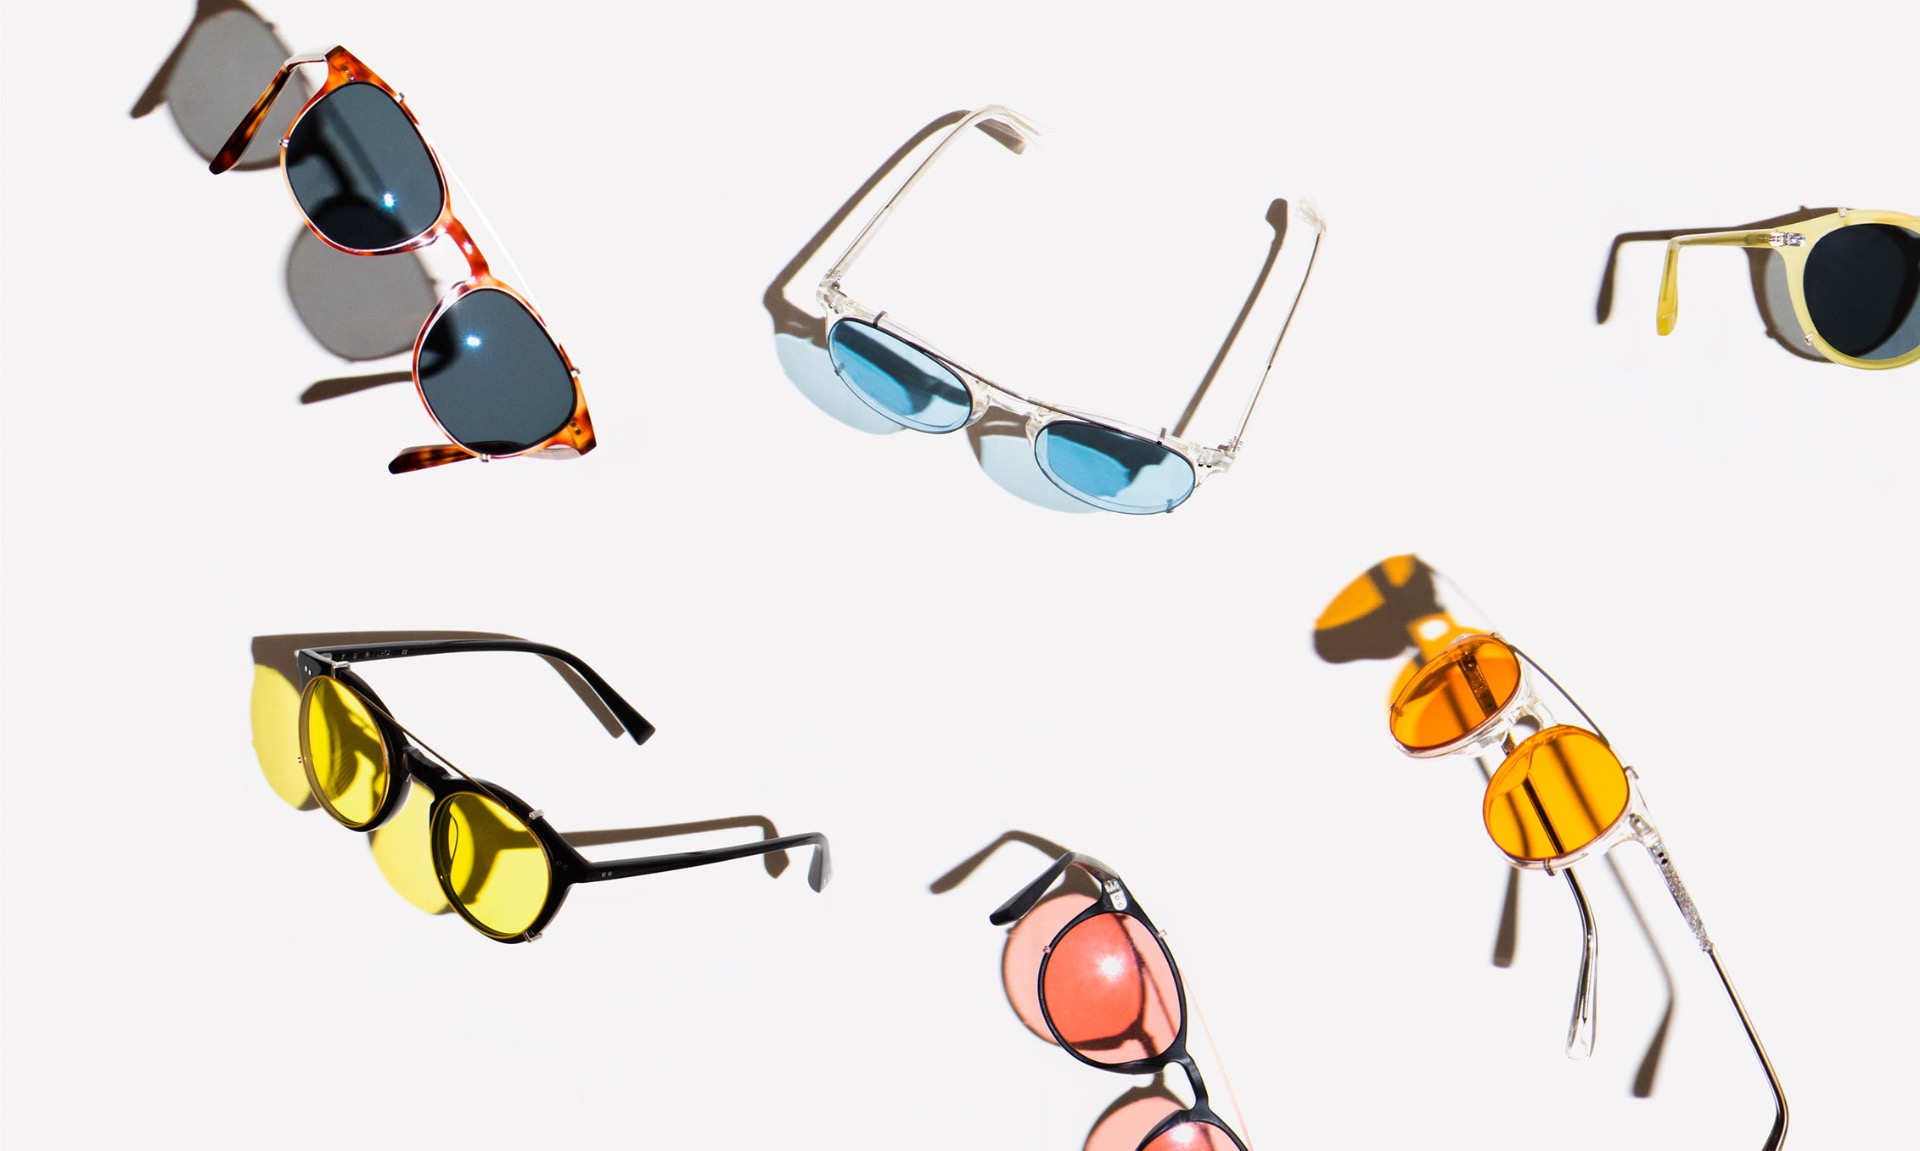 8 Berlin Eyewear Designers You Need To Know For Your Next Pair of Glasses Kuboraum Mykita Lunettes Kollektion ic!berlin Yun Berlin